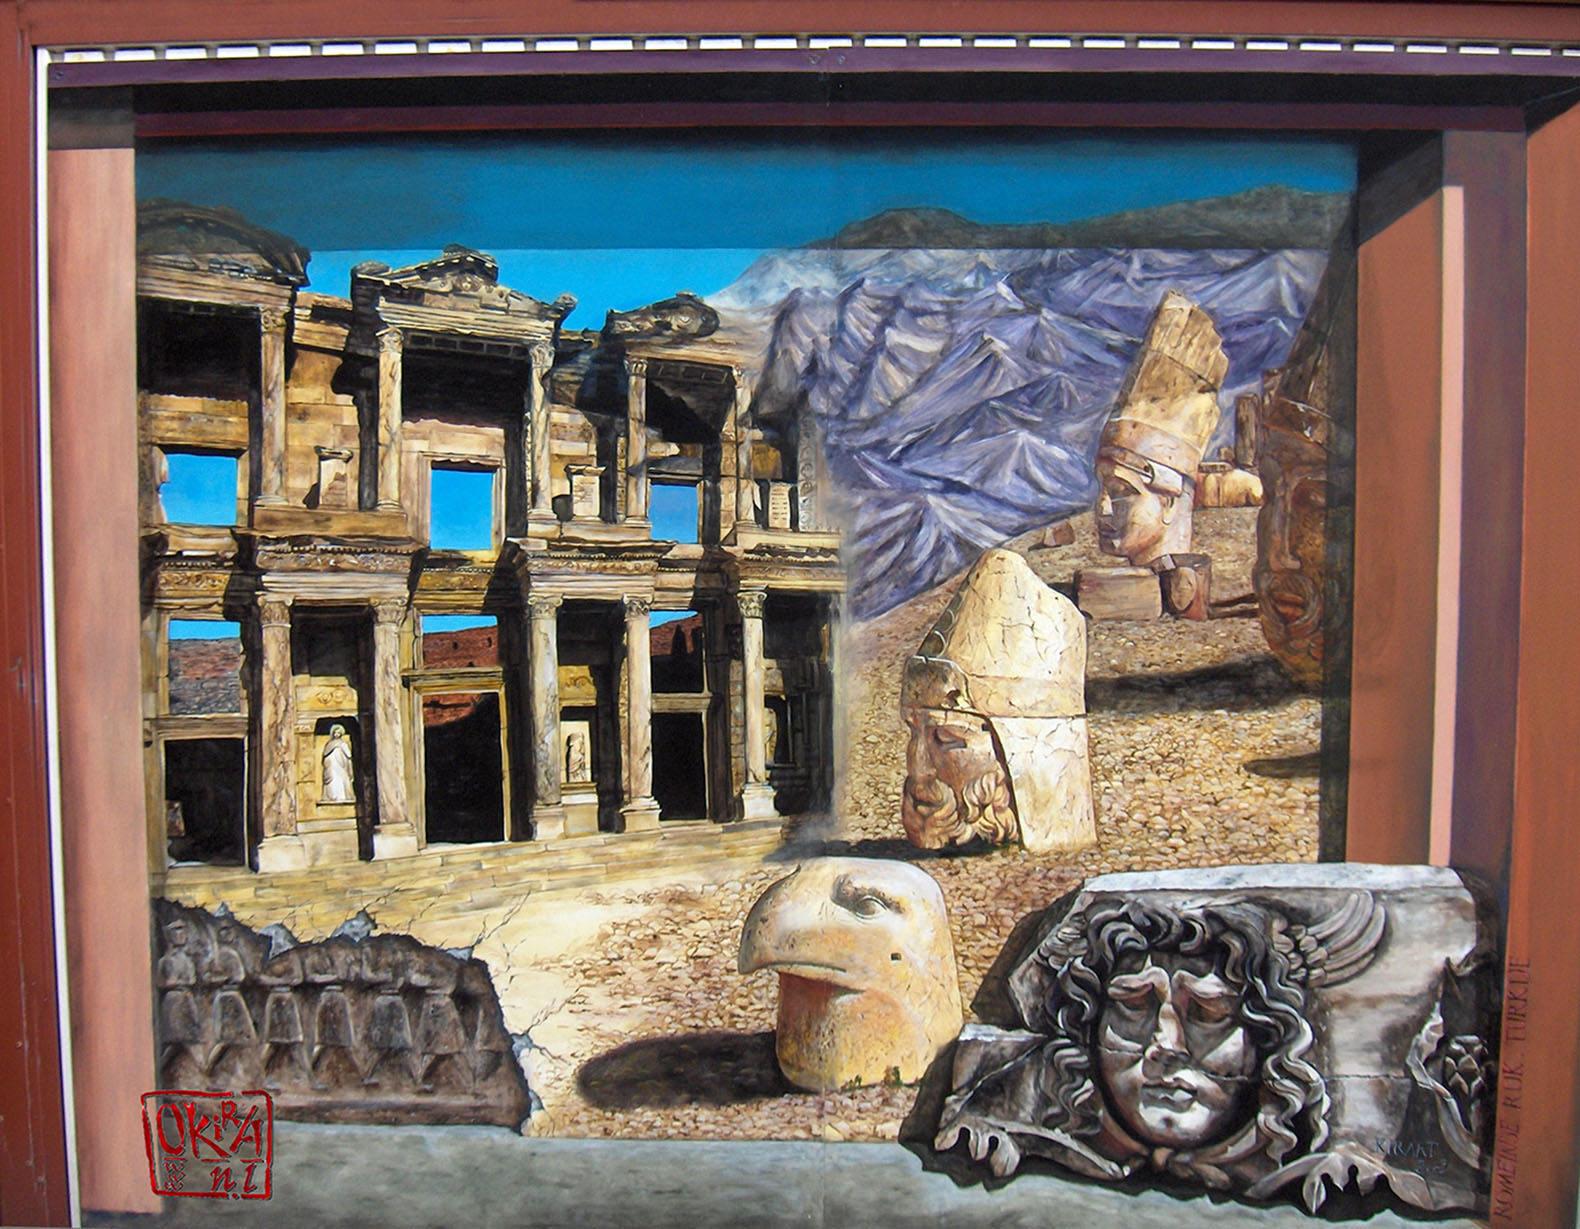 murals my blog trompe l oeil mural roman empire turkey by kira outembetova